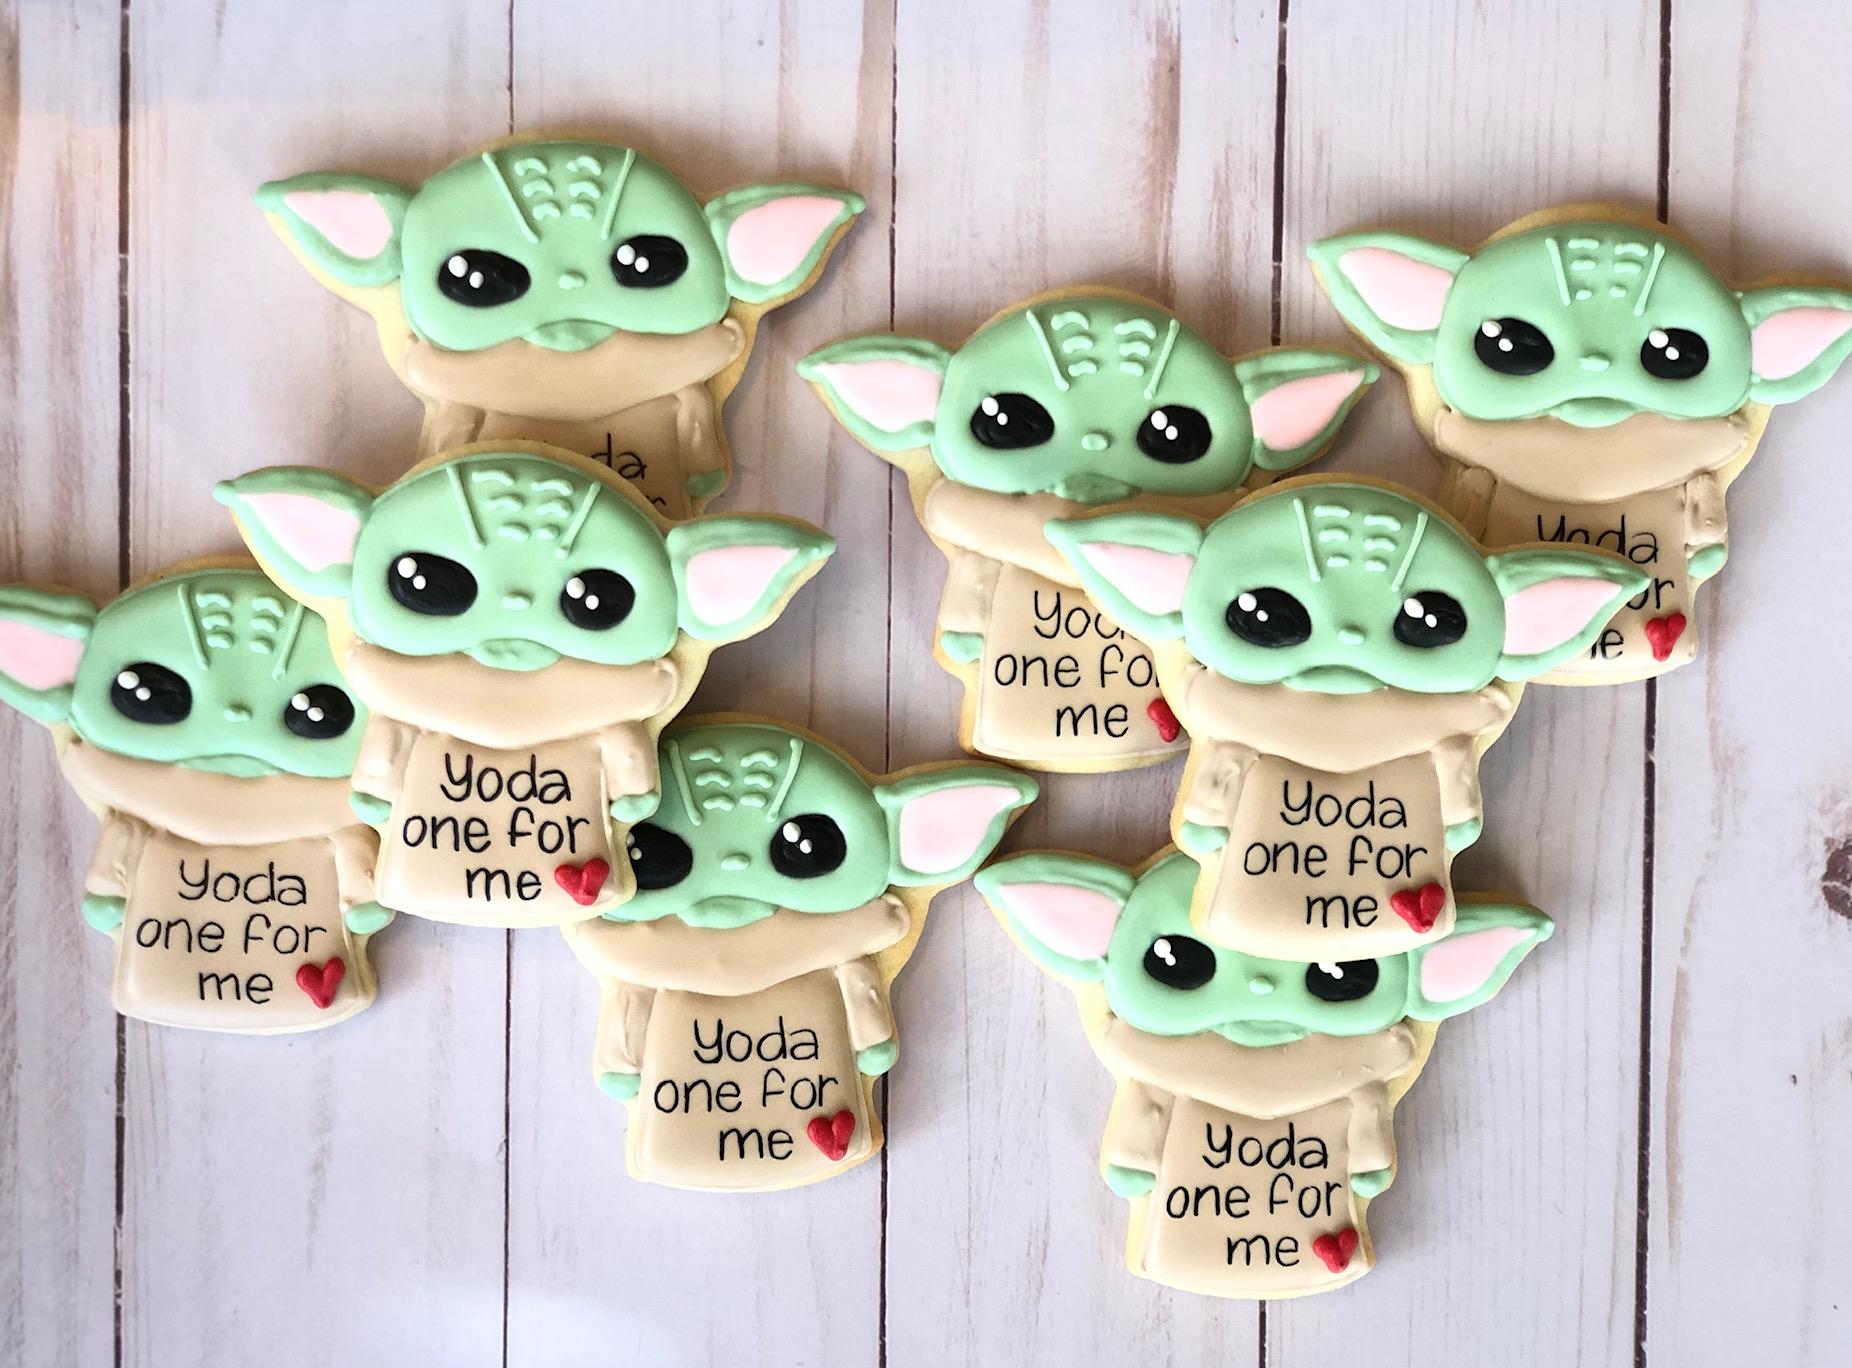 Baby Yoda Custom Cookies